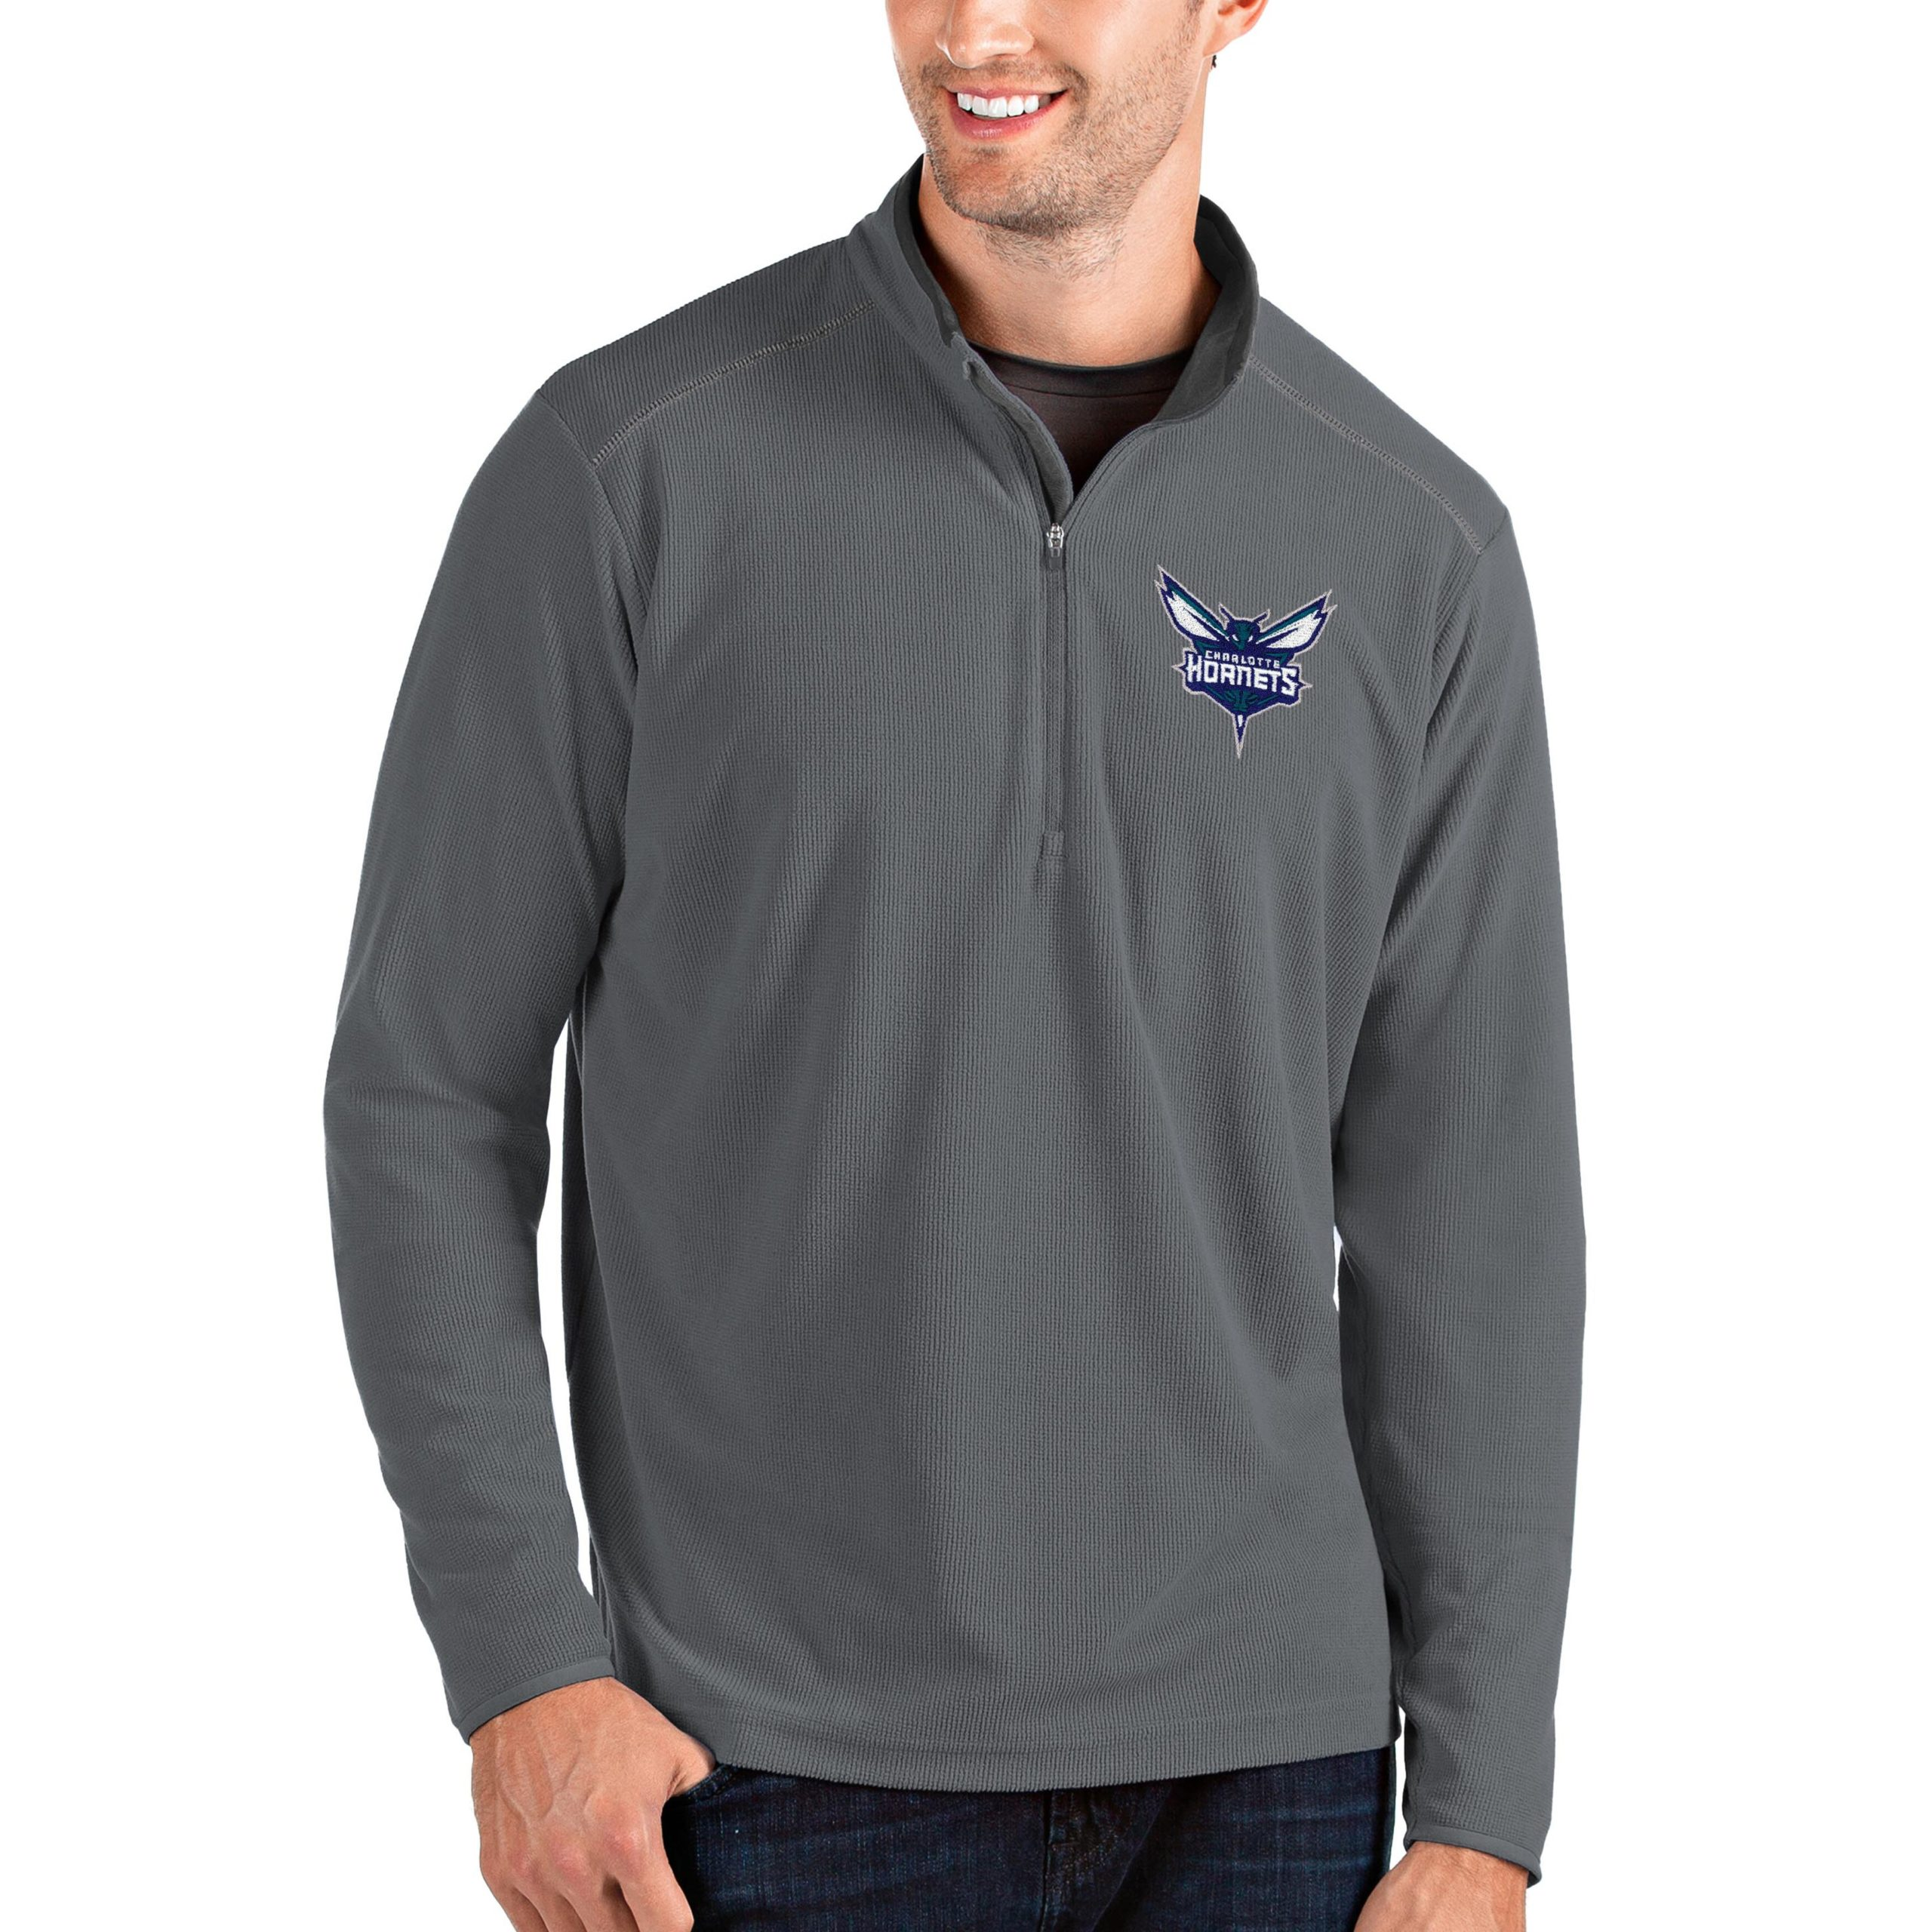 Charlotte Hornets Antigua Big & Tall Glacier Quarter-Zip Pullover Jacket - Gray/Gray